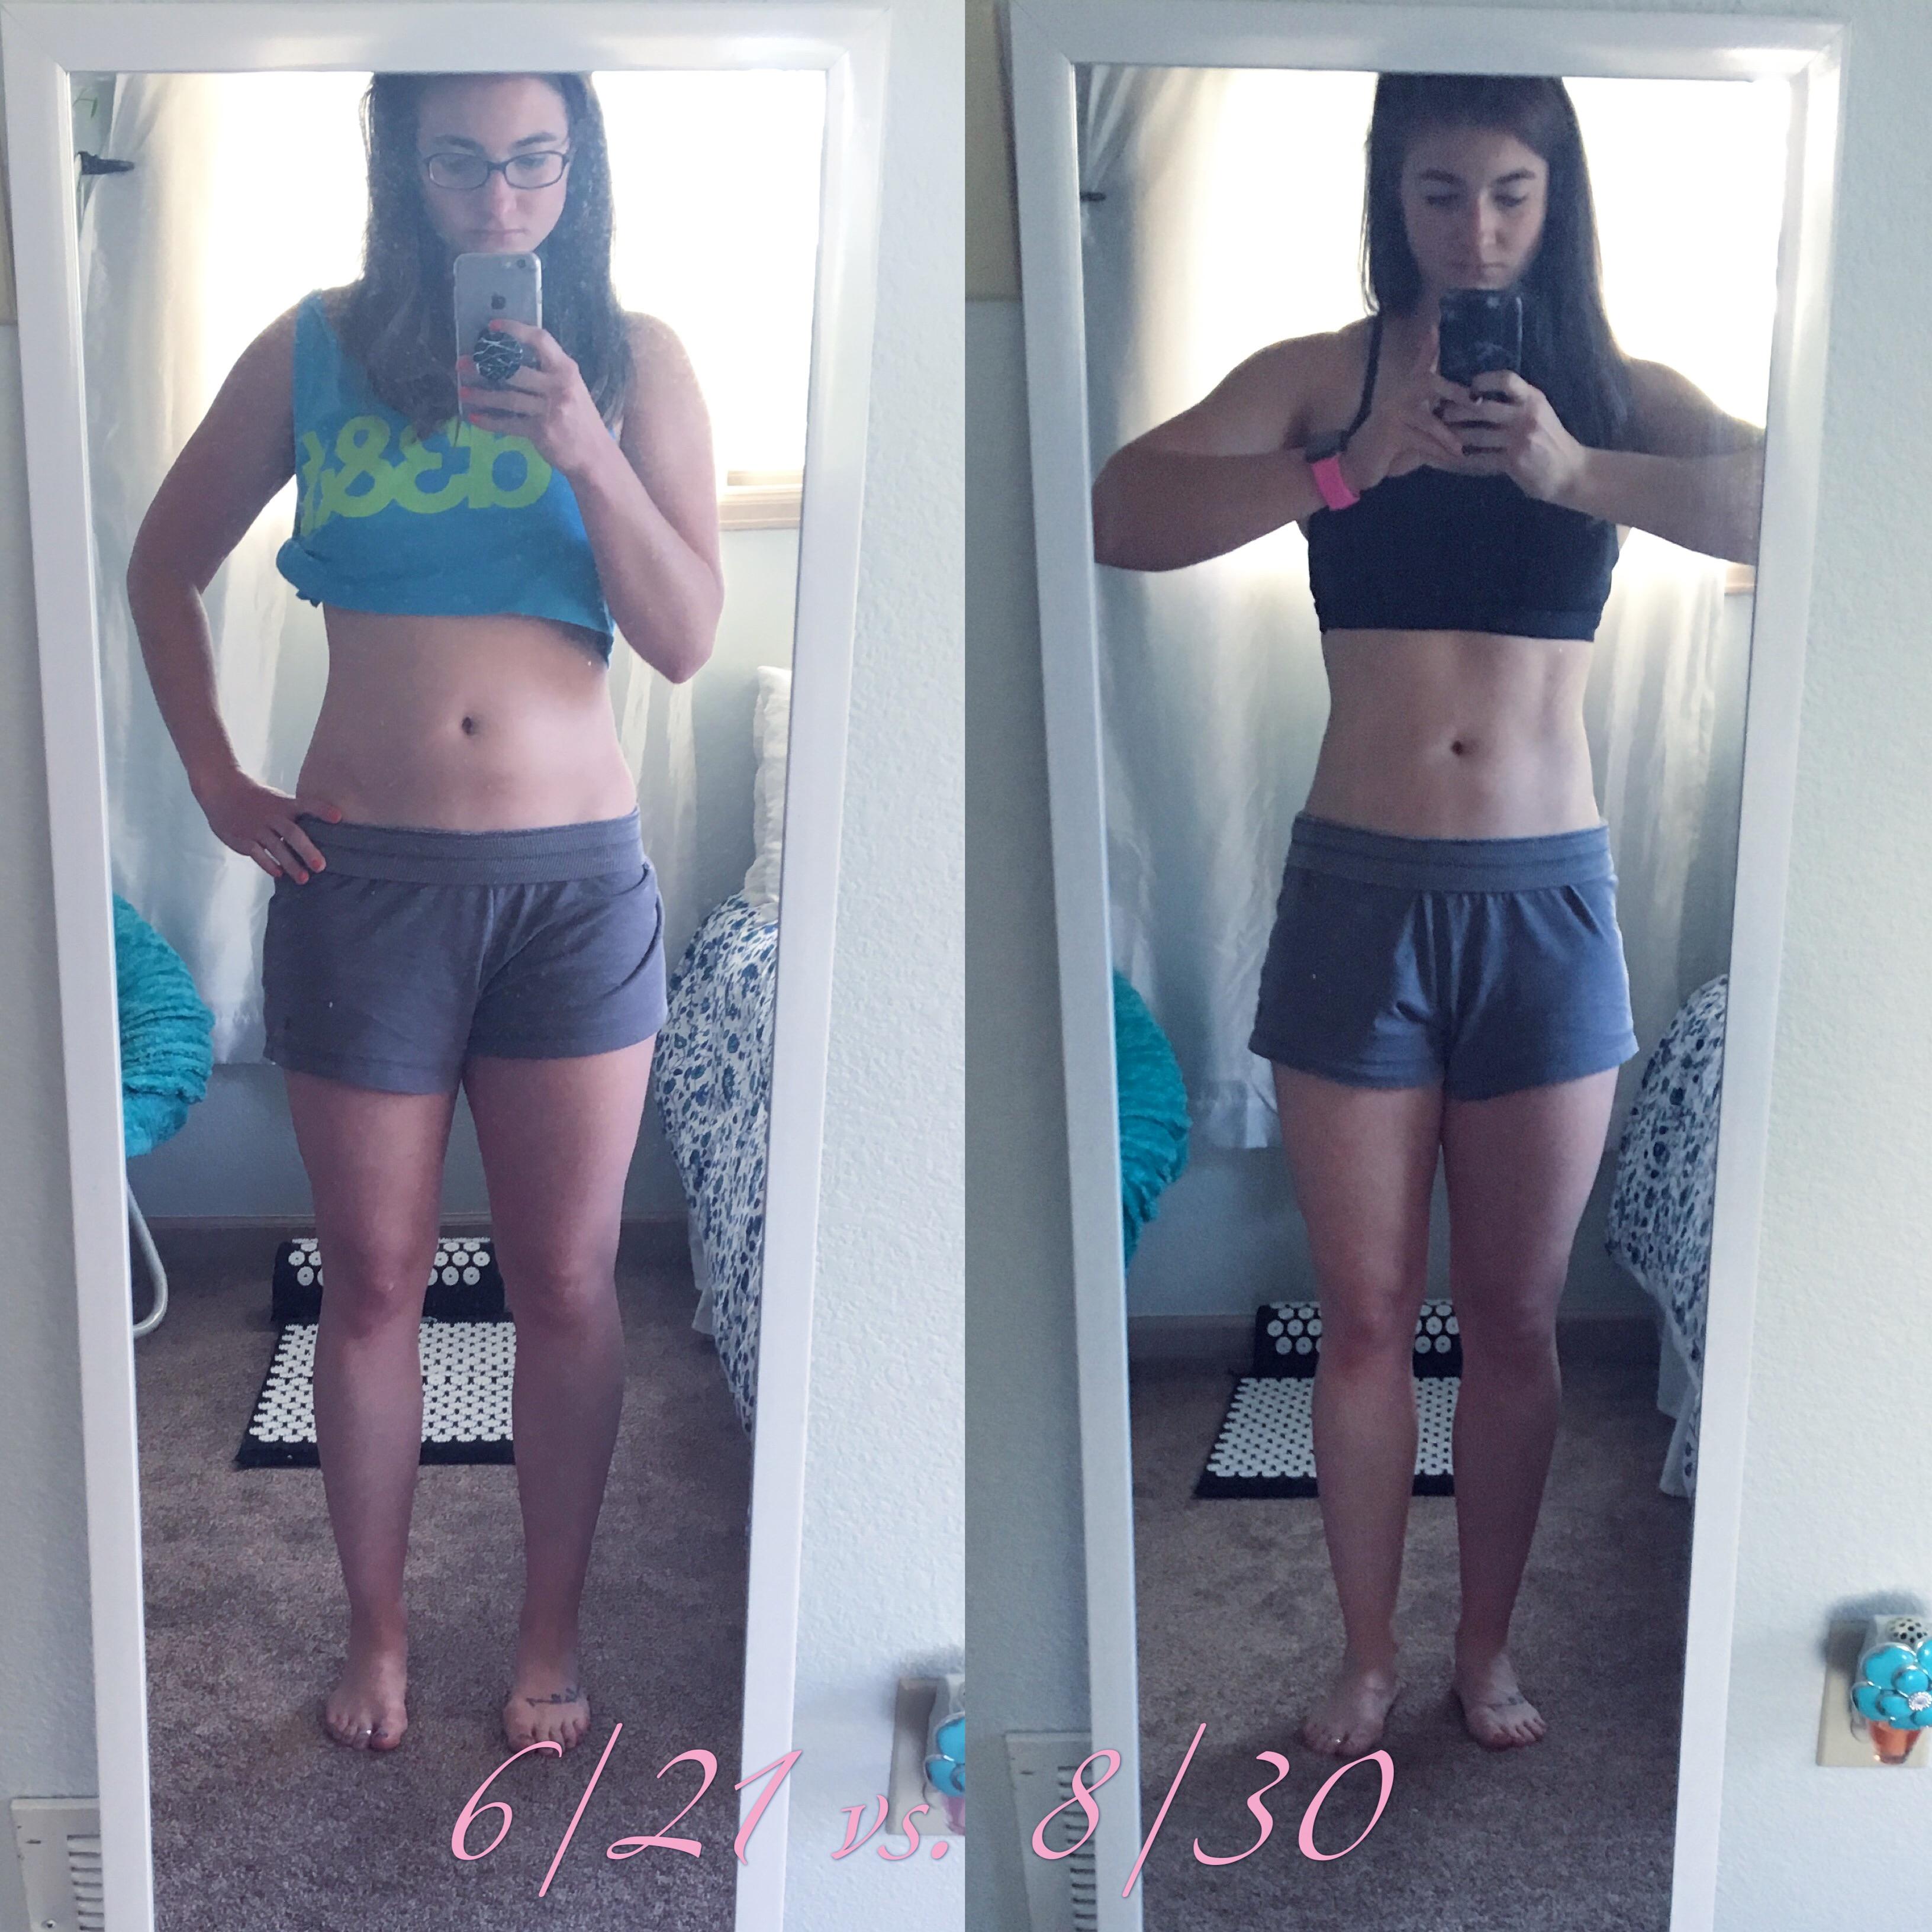 summer of wellness | Moving Mountains Wellness | muscle | training | weightless | fat loss